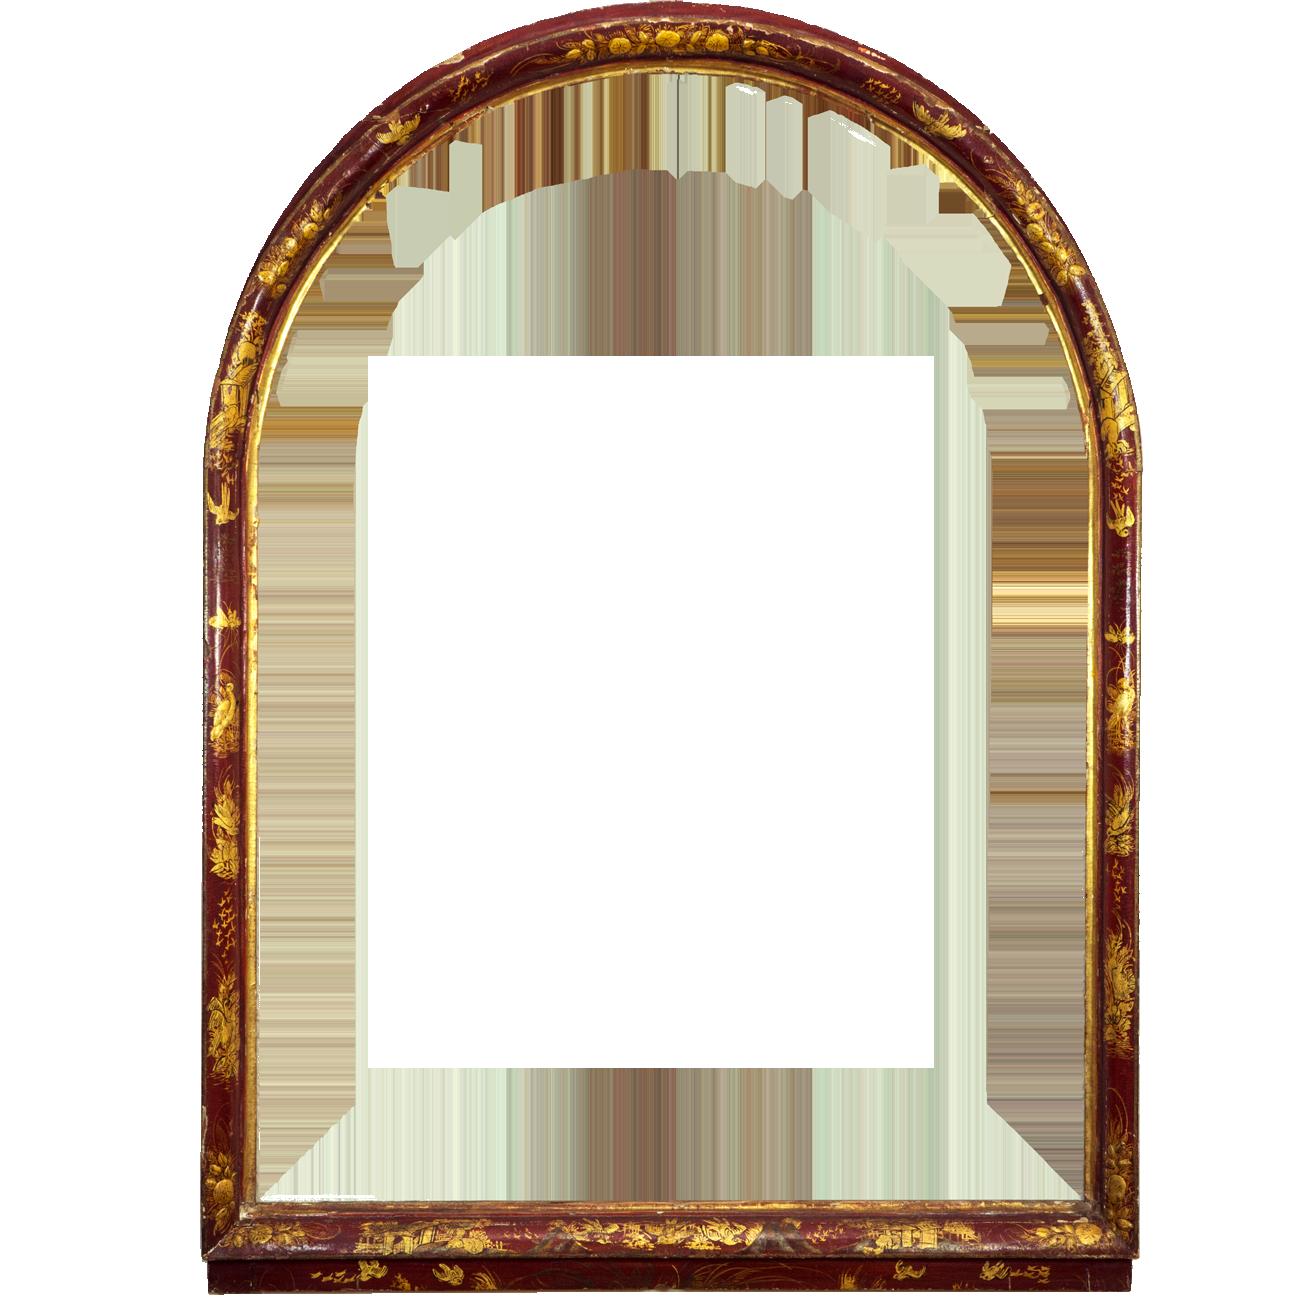 Chinoiser Lackrahmen - Antike Rahmen